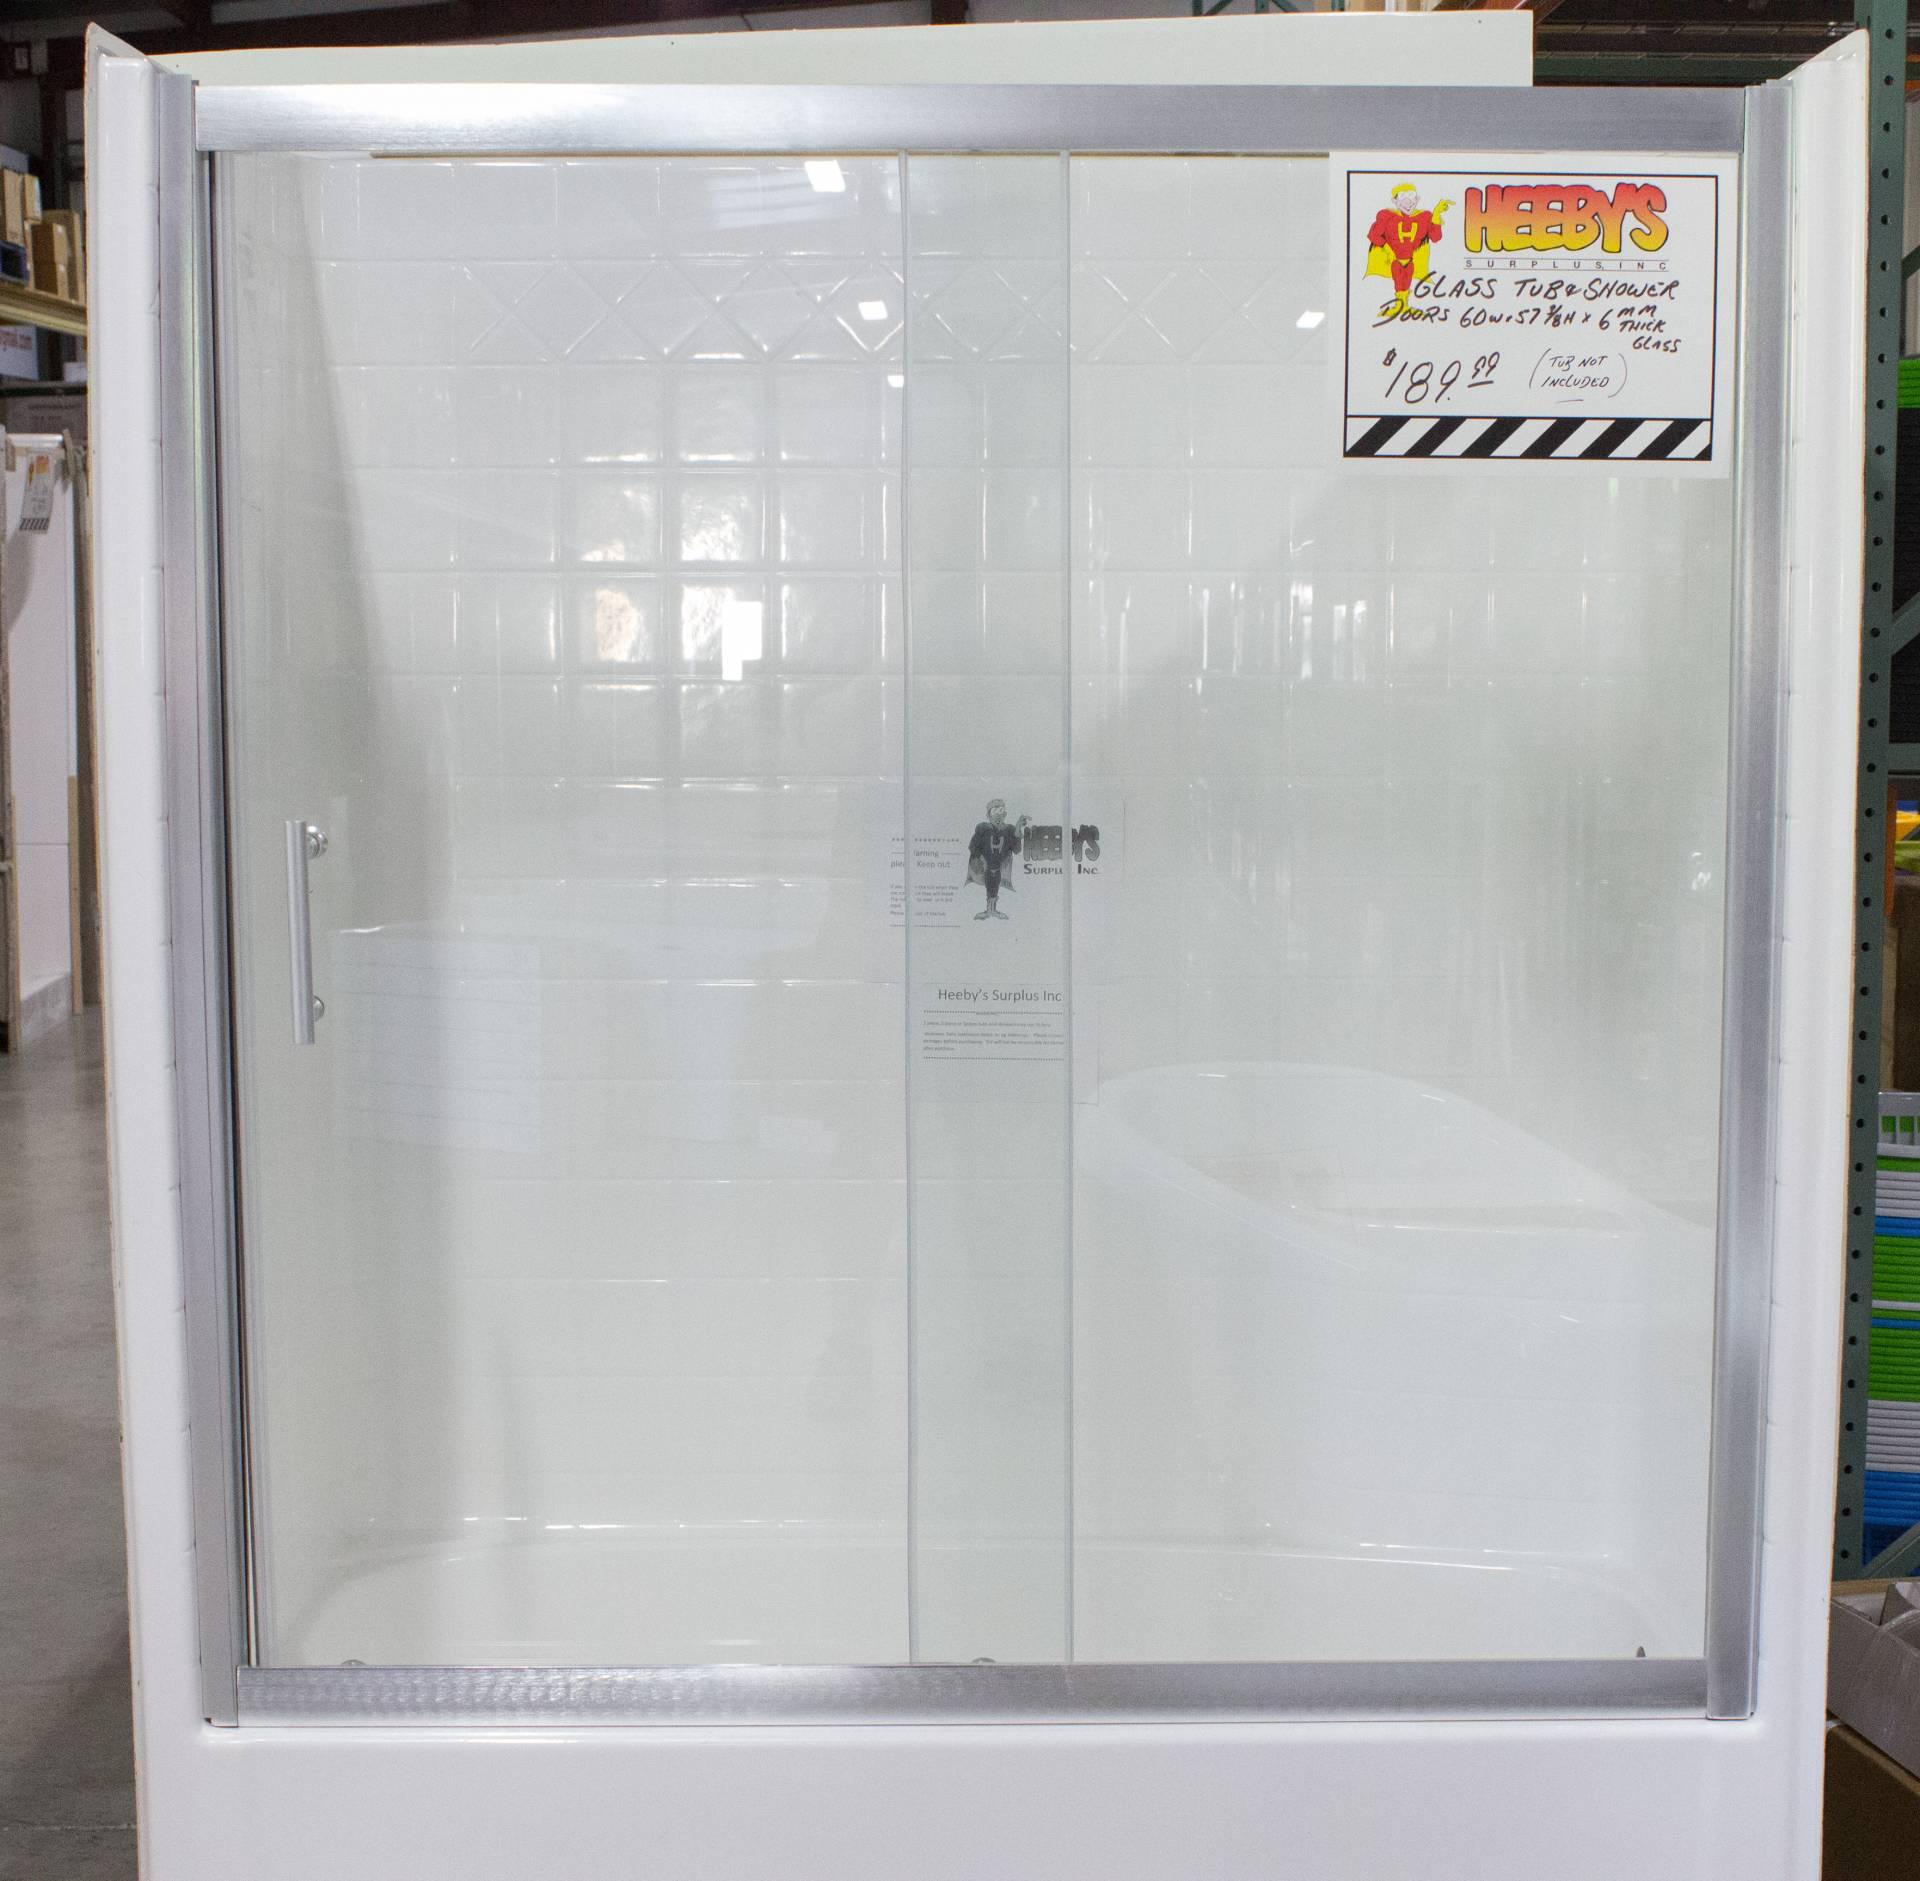 RTJ SDL-1 Sliding Shower Door & RTJ SDL-1 Sliding Shower Door   Heeby\u0027s Surplus Inc.